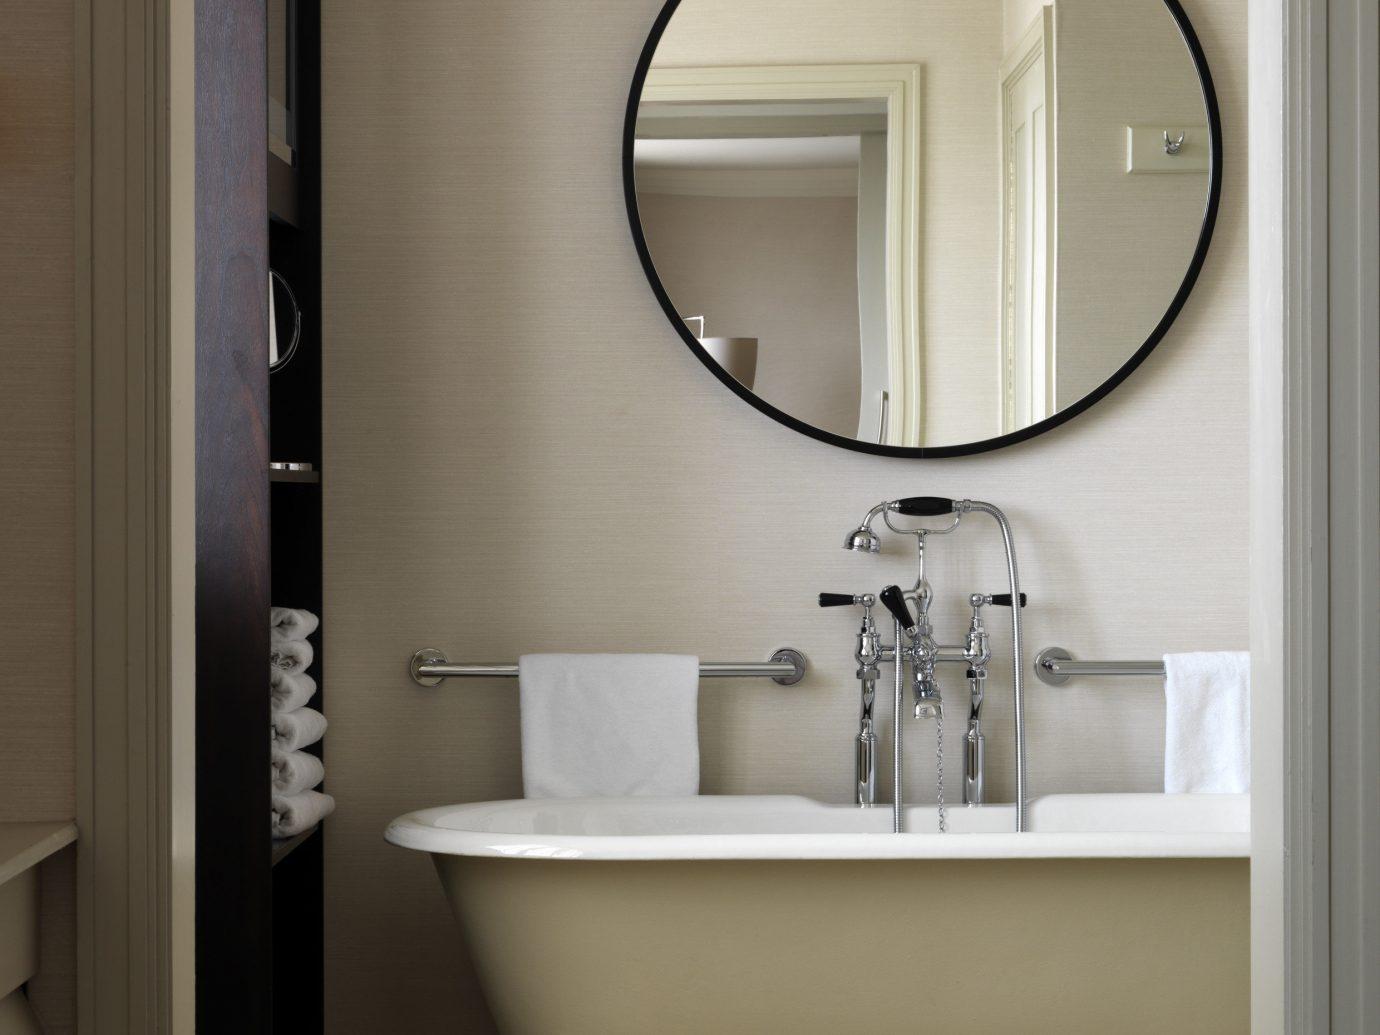 Dublin Hotels Ireland wall indoor bathroom mirror bathroom accessory room tap toilet sink bathroom cabinet interior design ceramic white plumbing fixture product design toilet seat bathroom sink floor angle window bidet